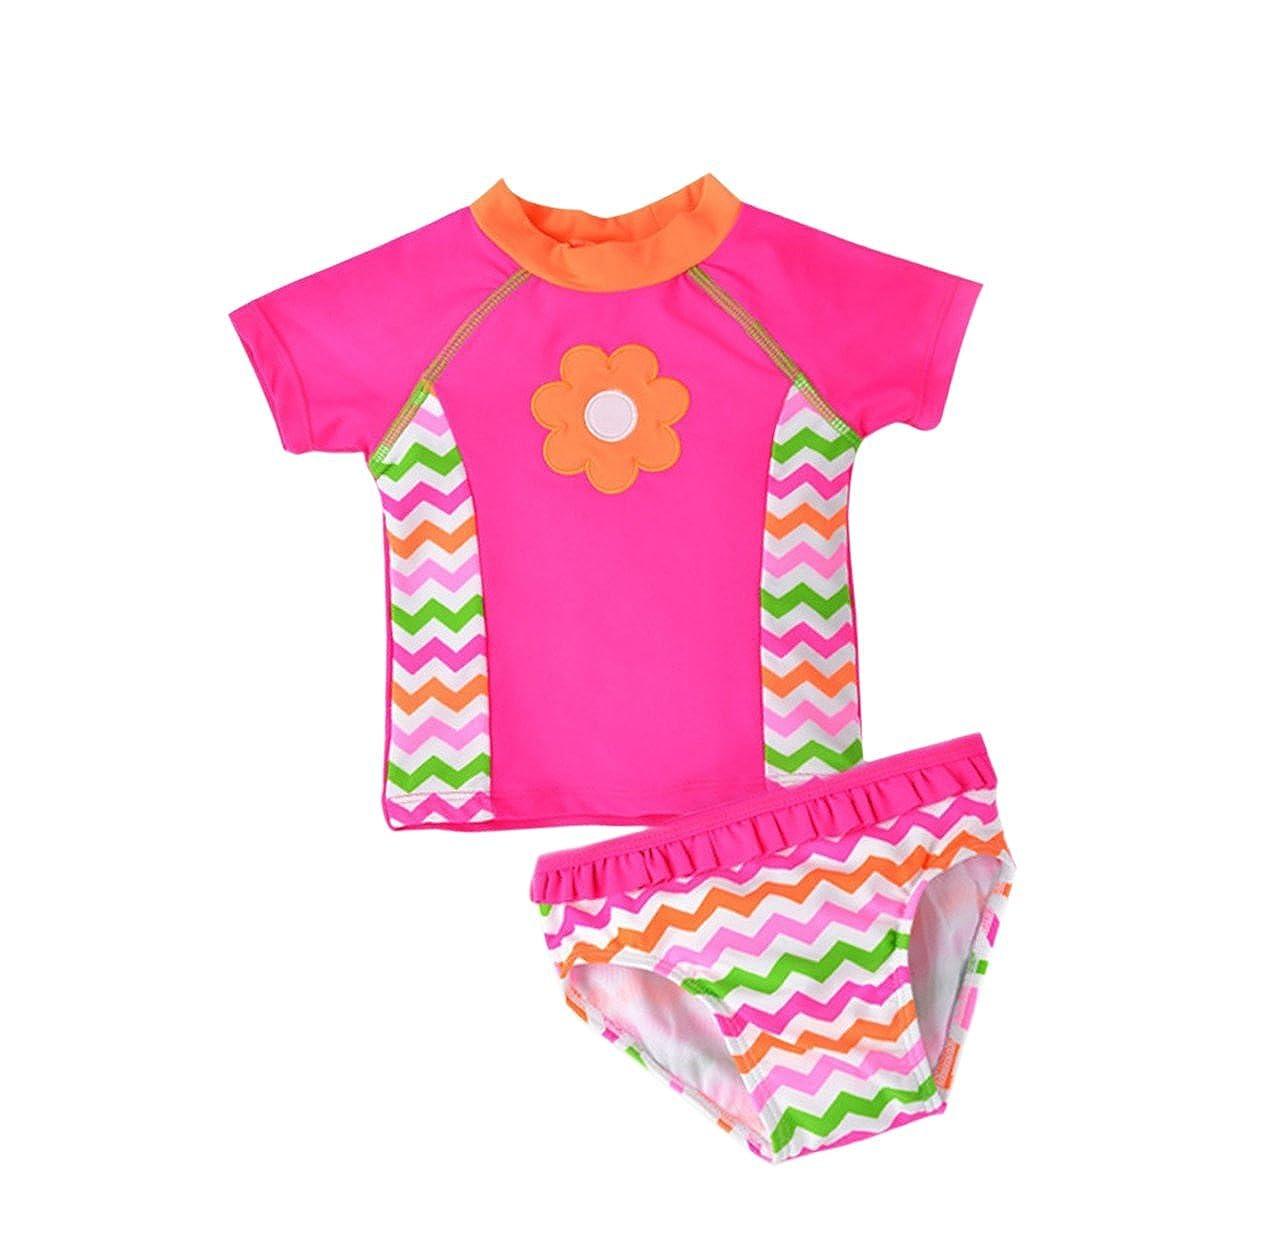 wildwalk Summer Baby Girl Short Sleeves Swimsuits Rash Guard Sets ChildBikini_022-1